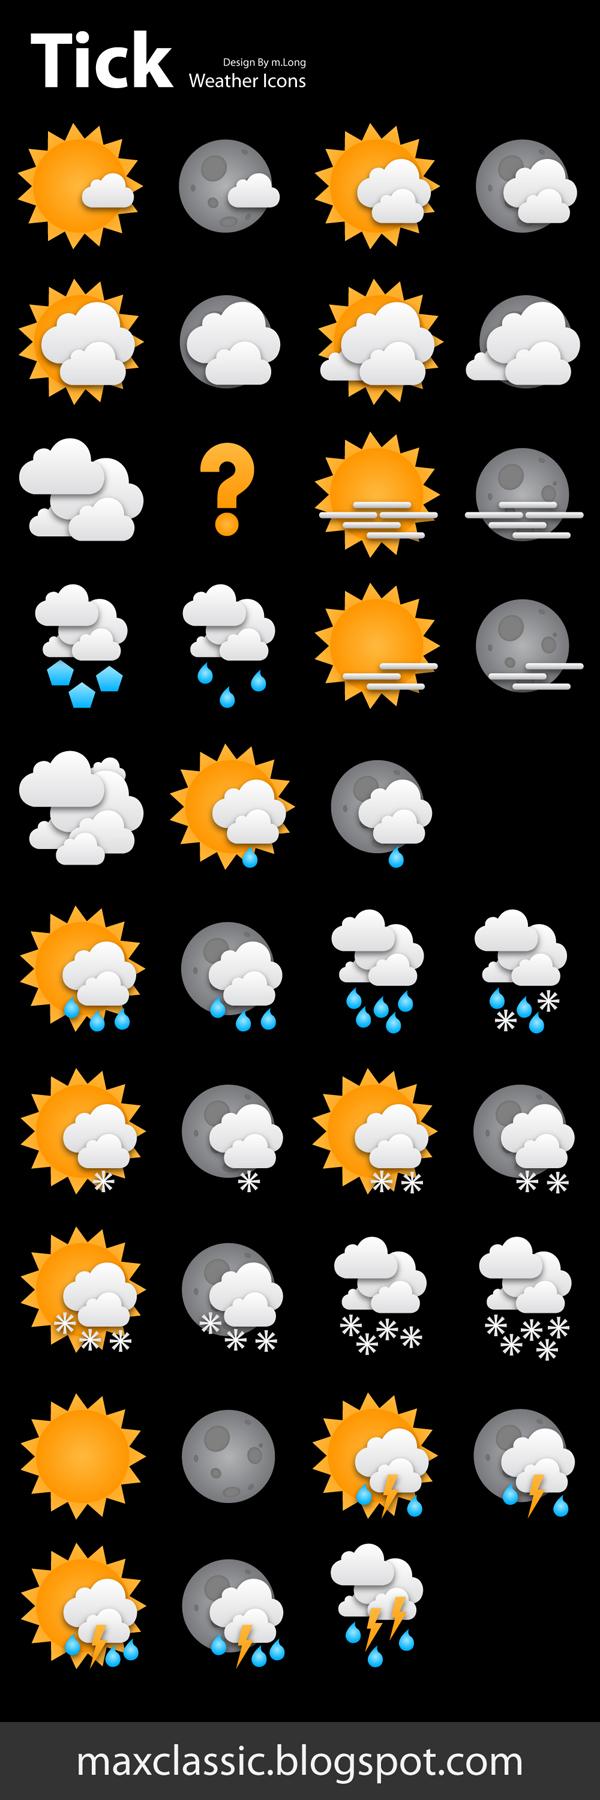 tick weather icons